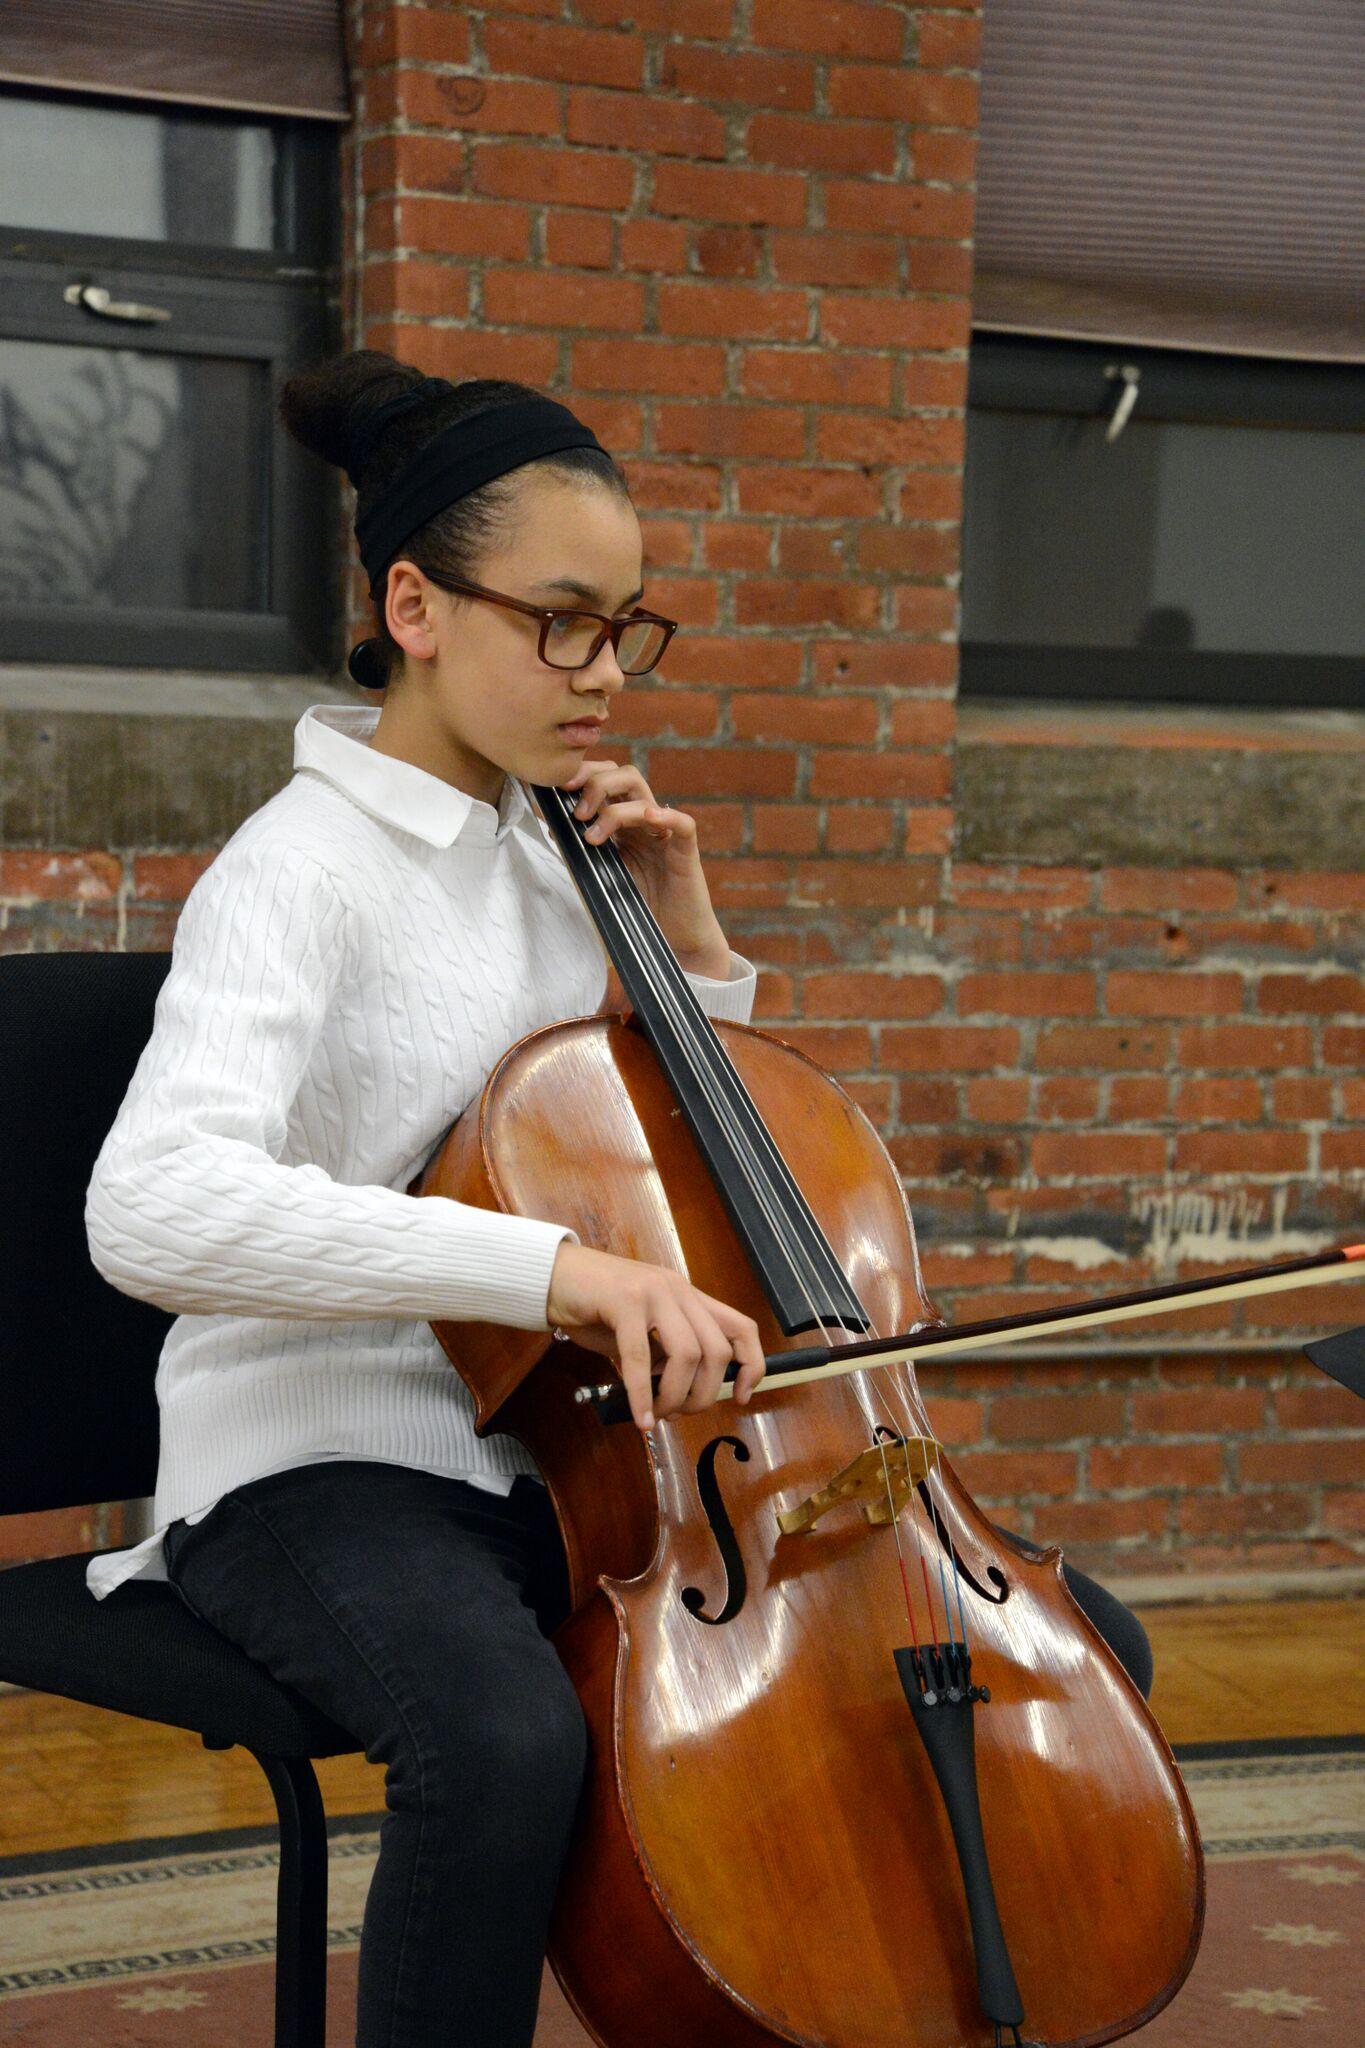 Alexis performing at her studio recital in 2018